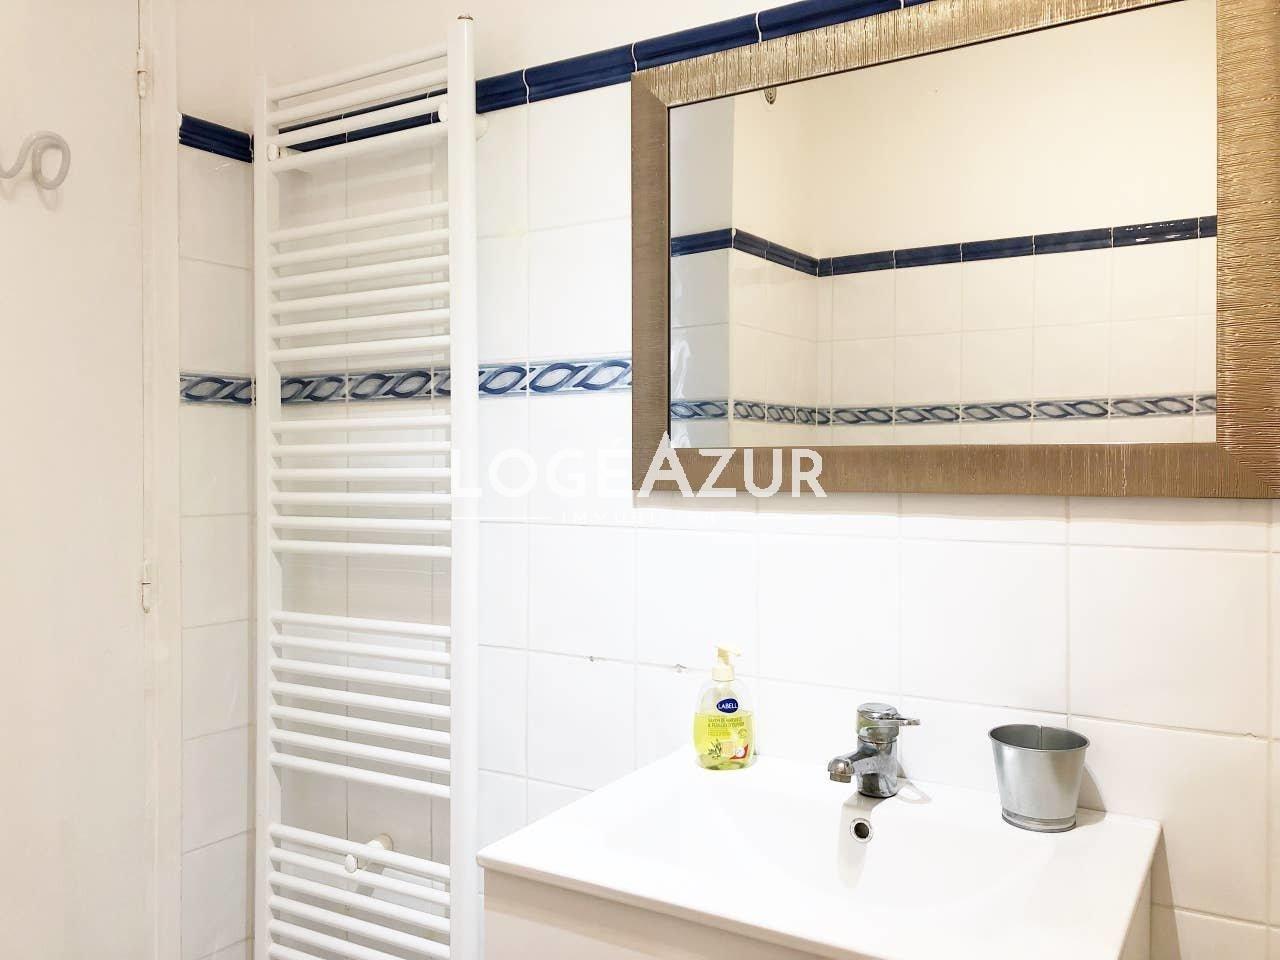 Affitto stagionale Appartamento - Cagnes-sur-Mer